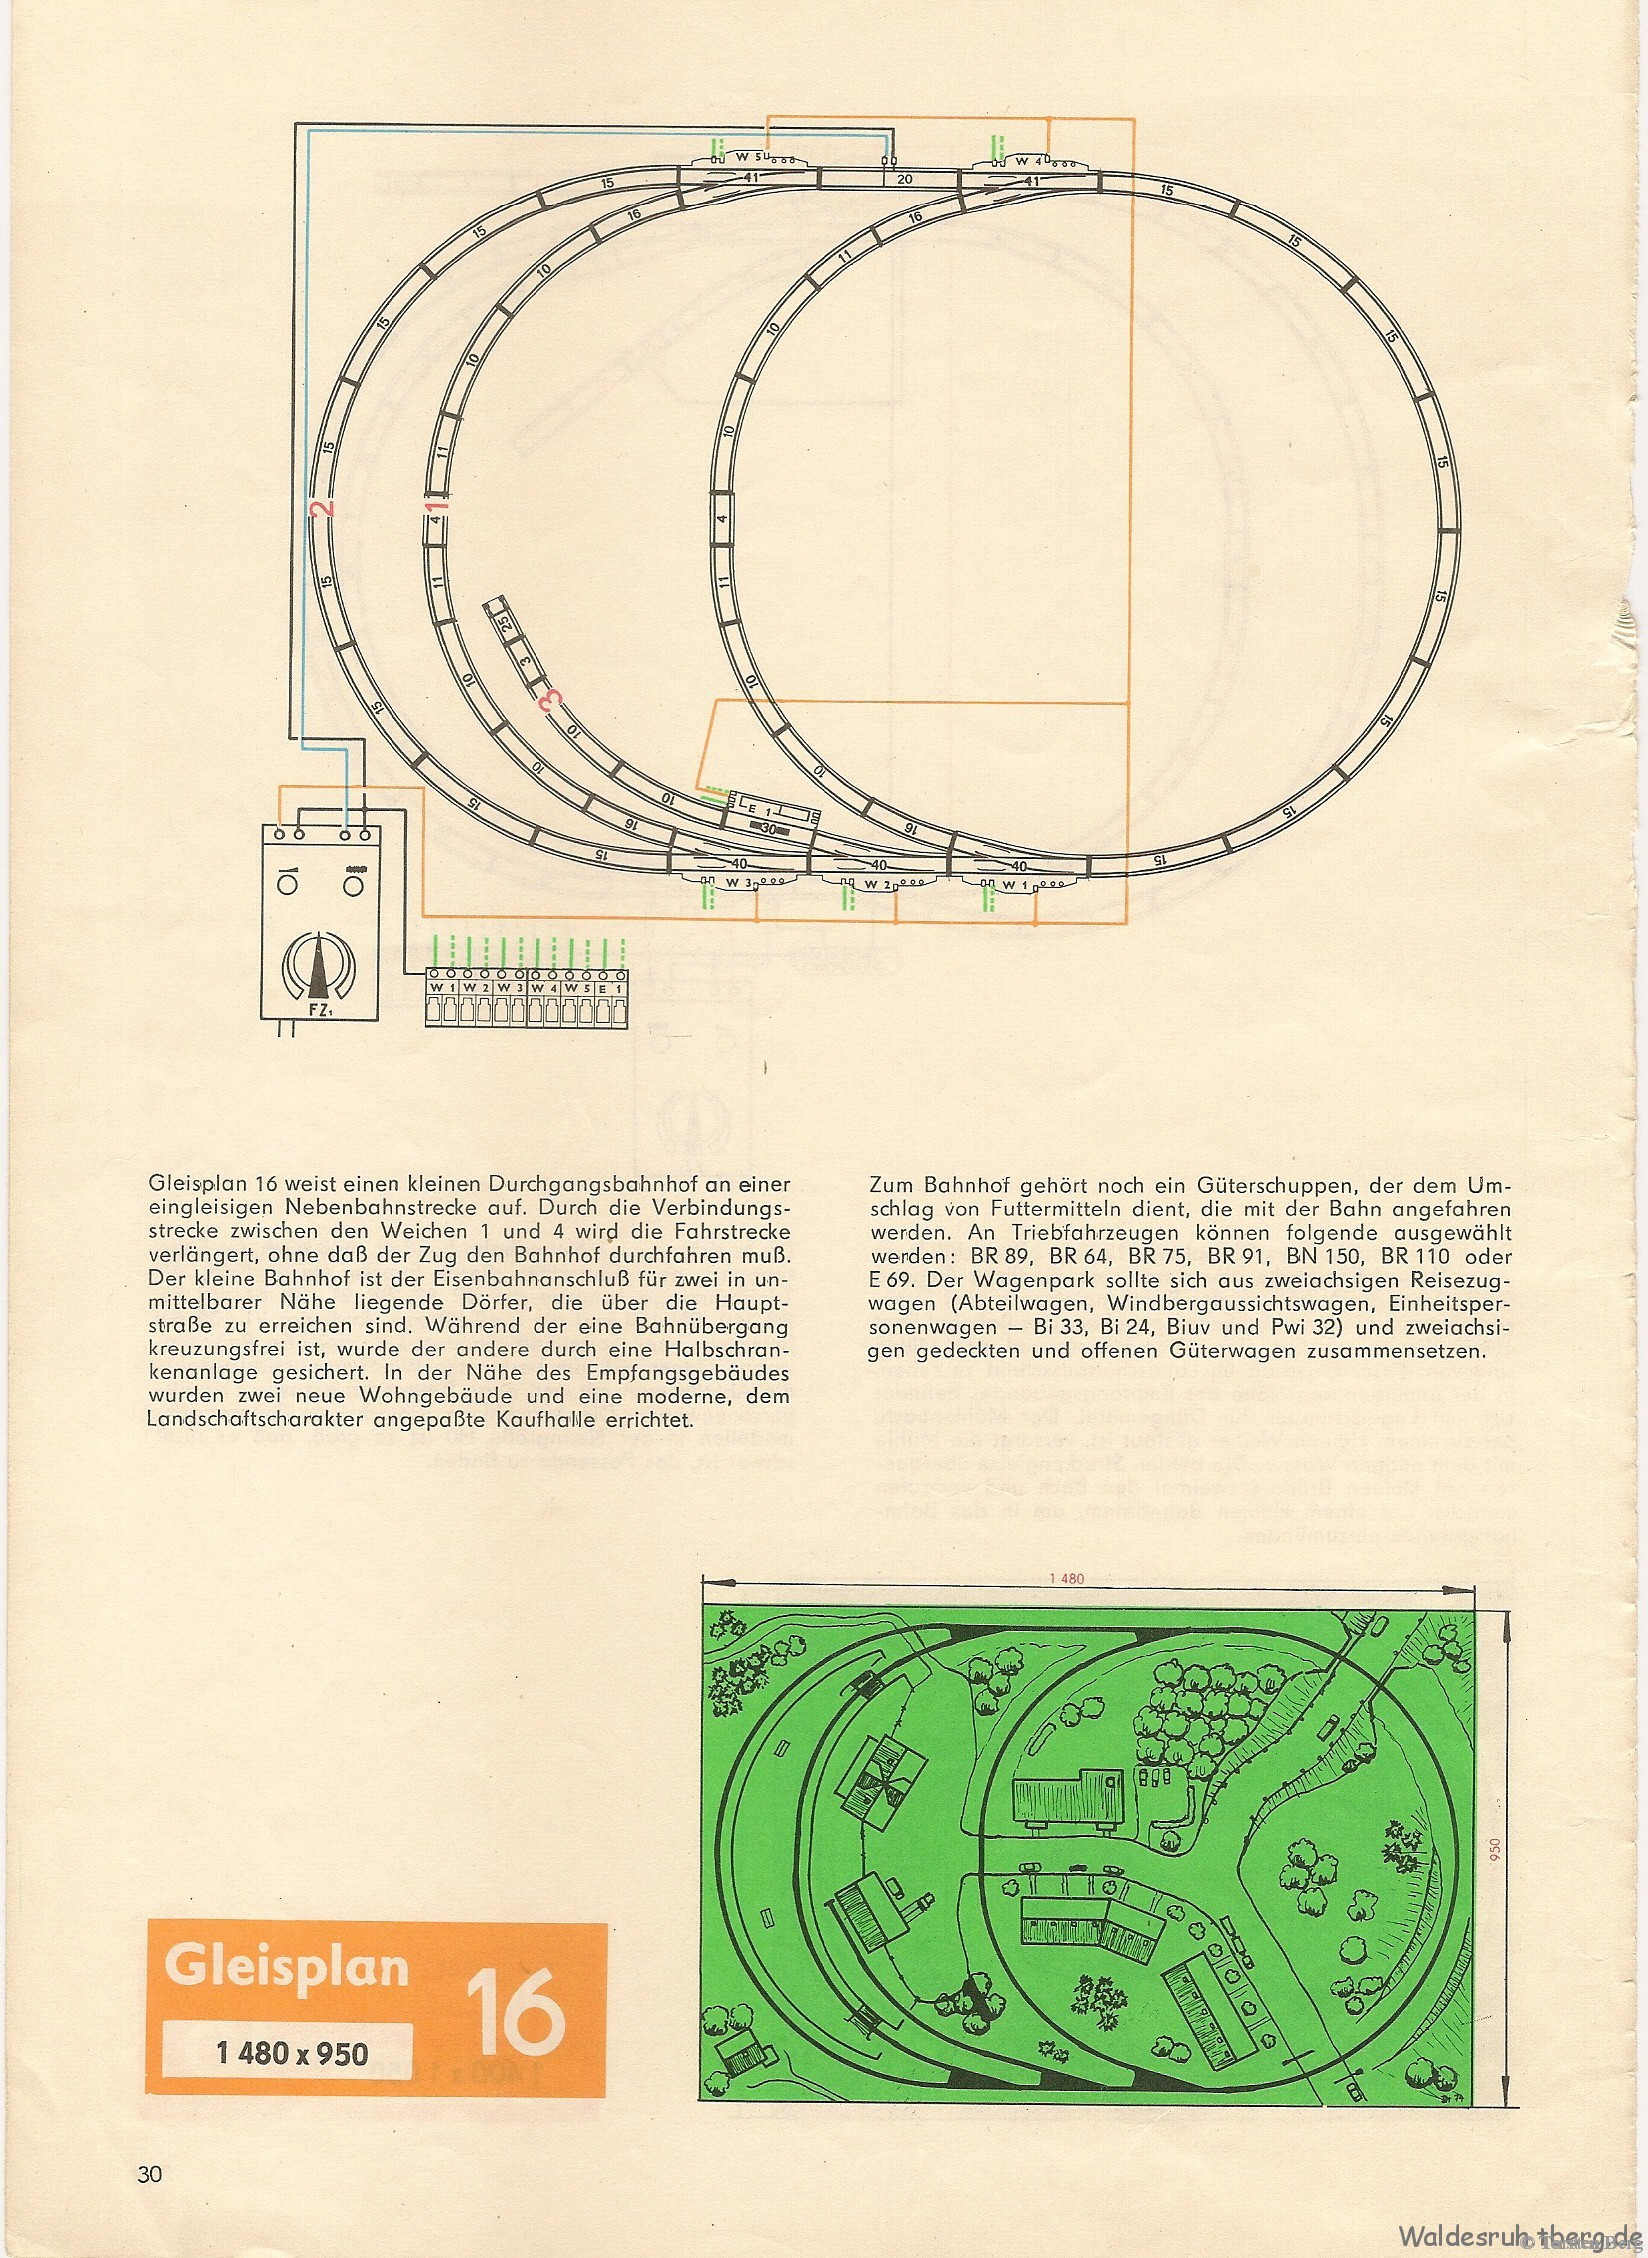 31 PIKO Standardgleis-Gleisplan 16